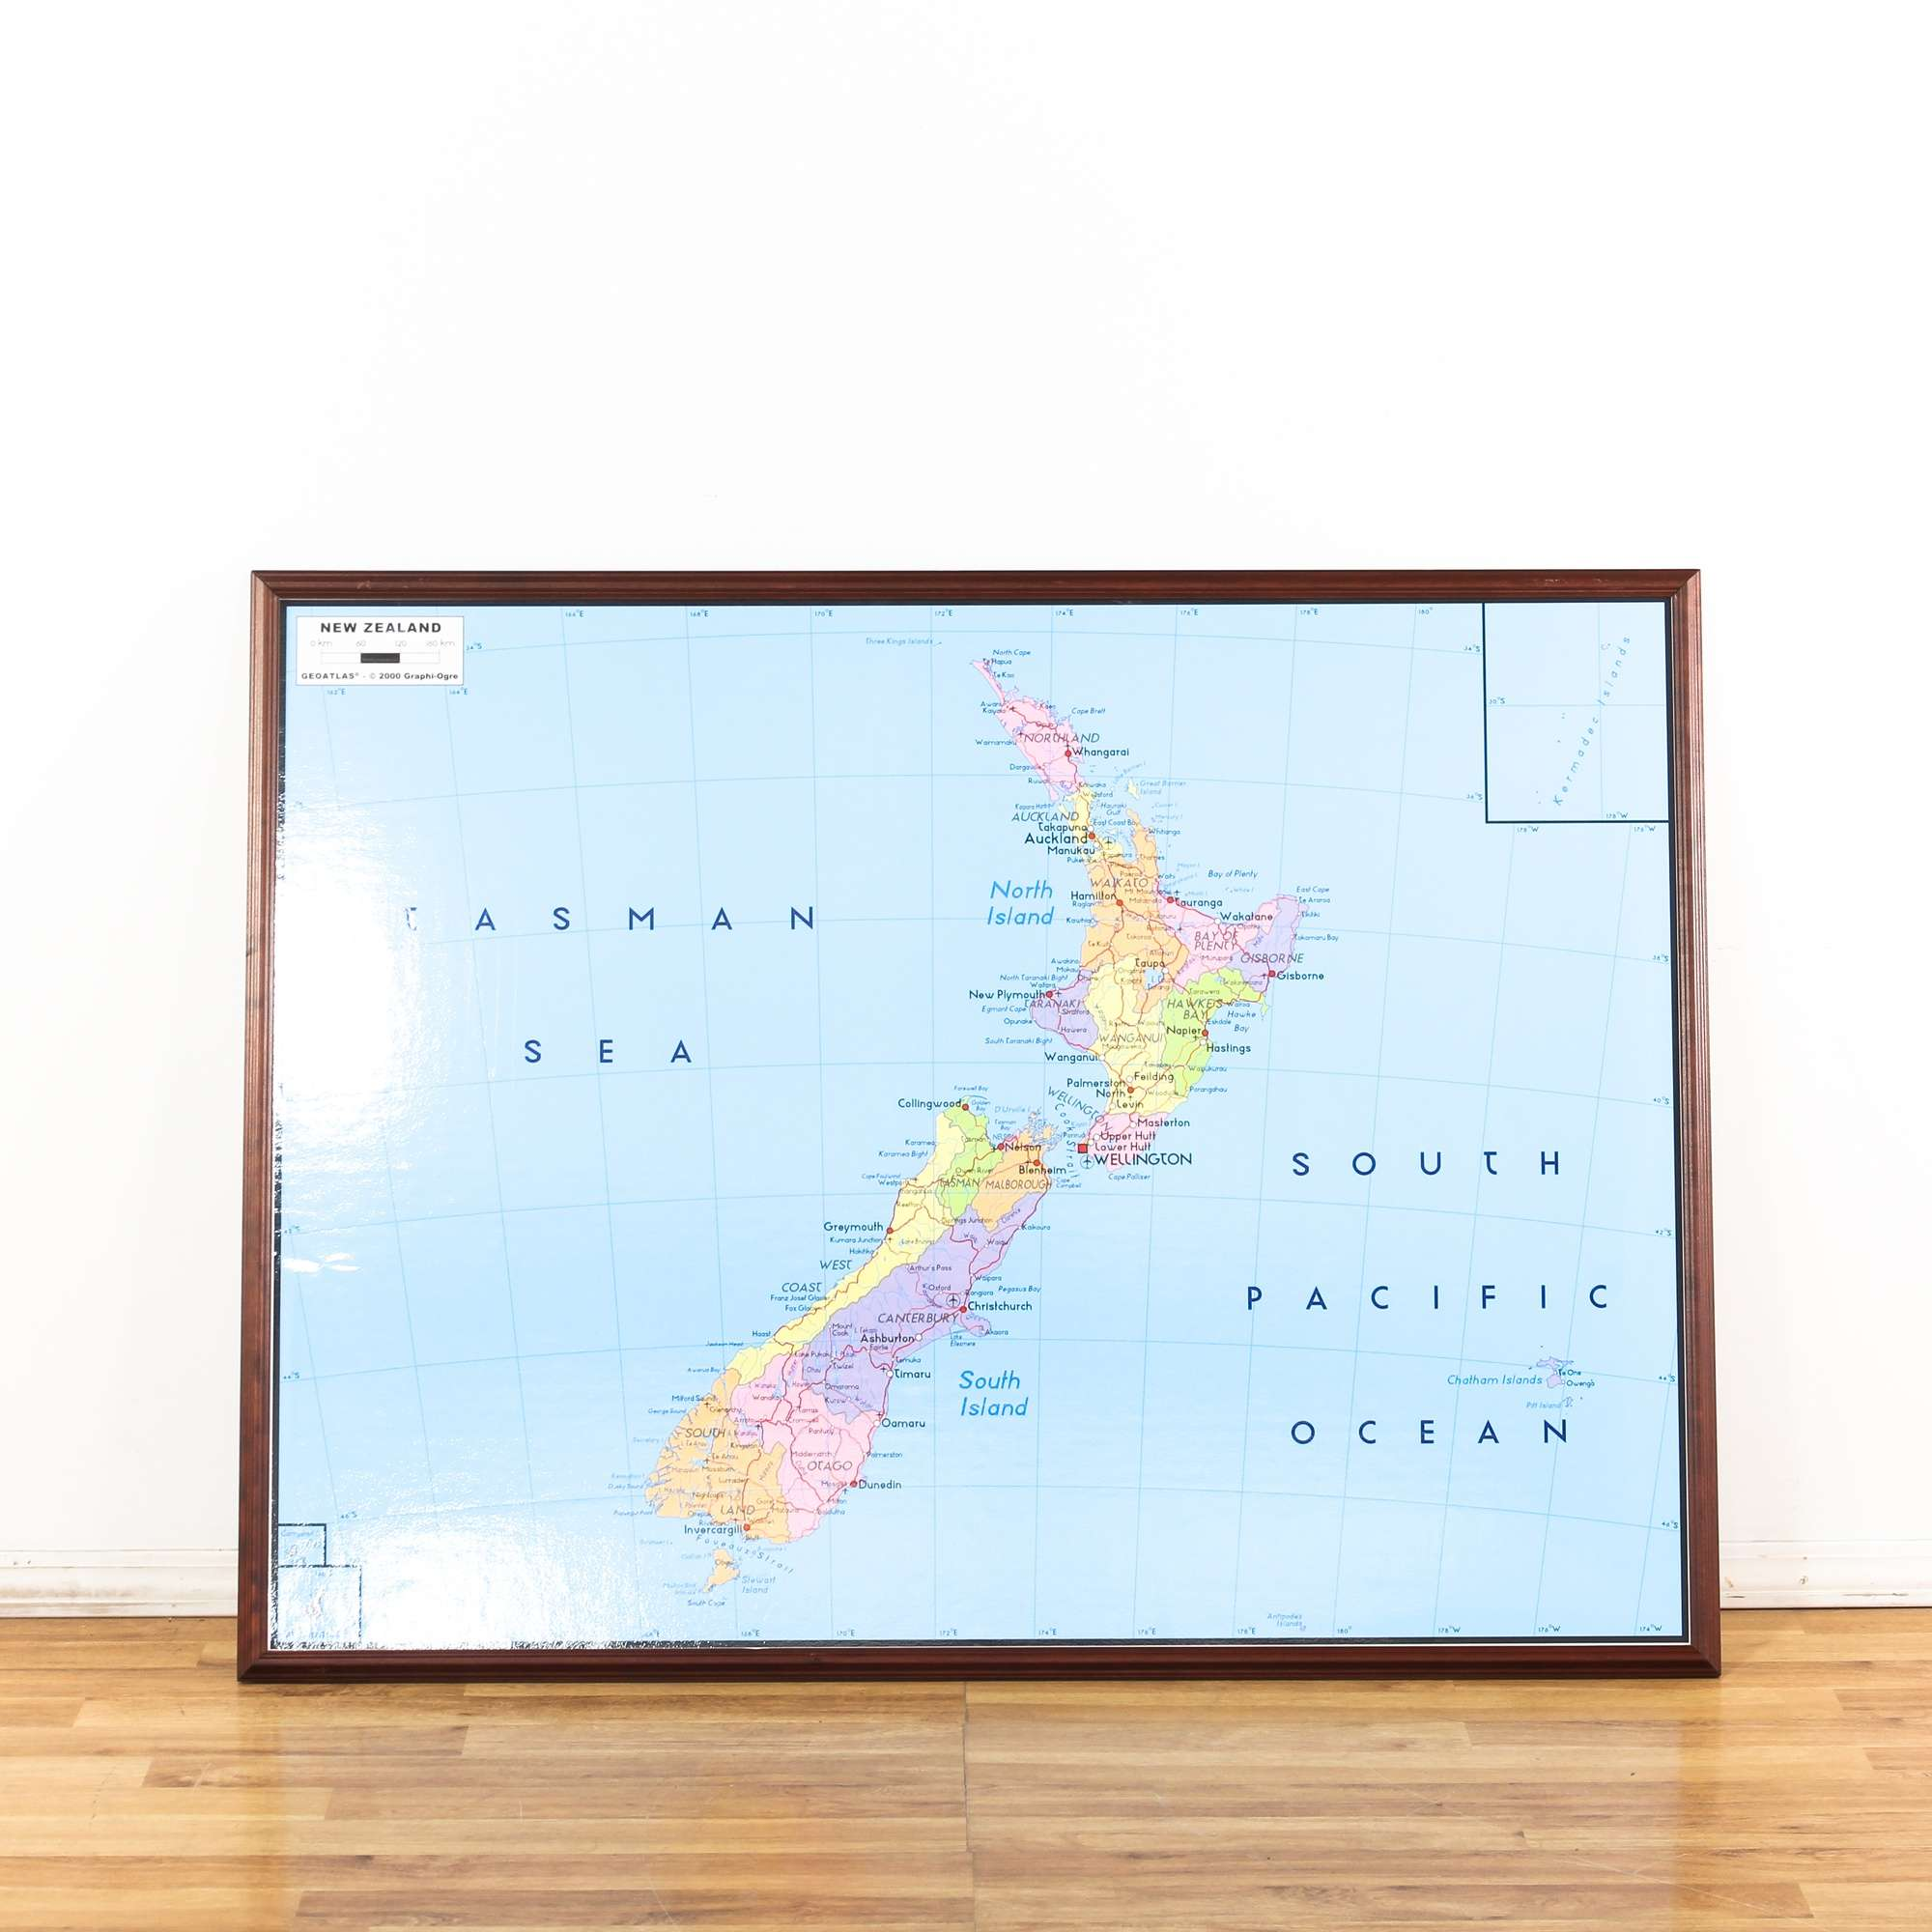 Wood Framed New Zealand Map Wall Art 3 Loveseat Vintage Furniture